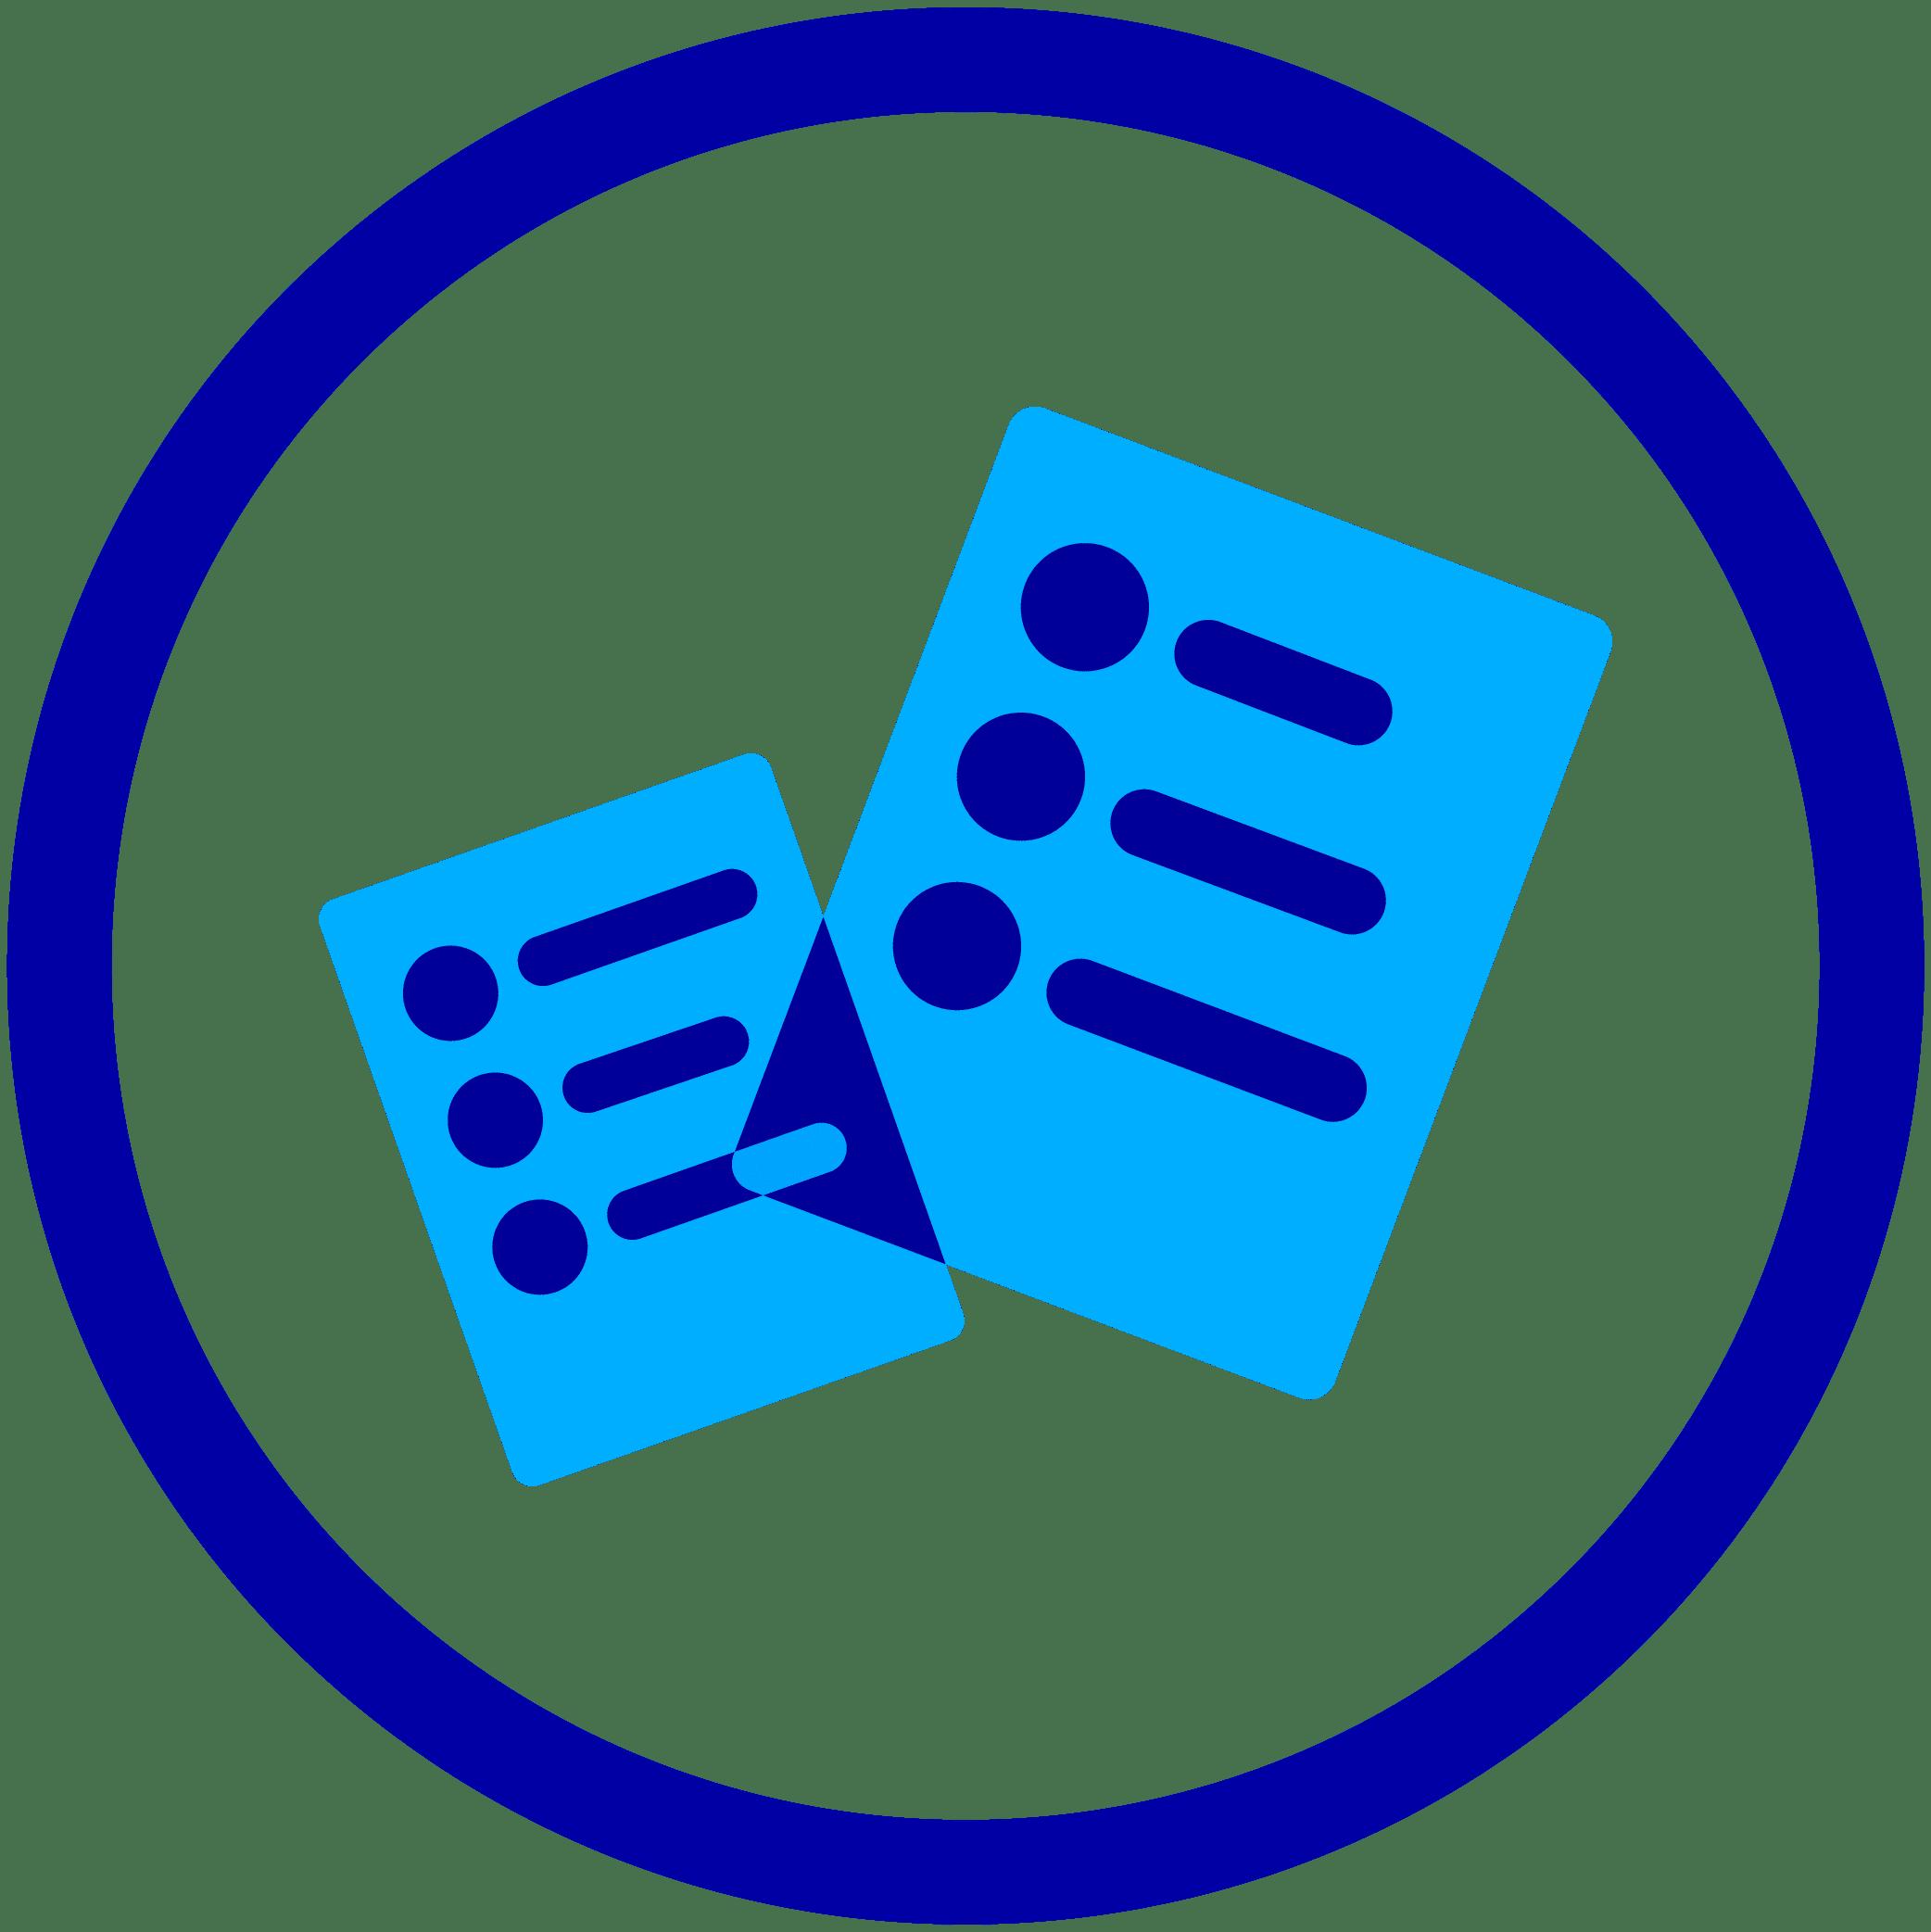 https://uk.fi-group.com/wp-content/uploads/sites/7/2021/09/blue-icons-set_1-07.png